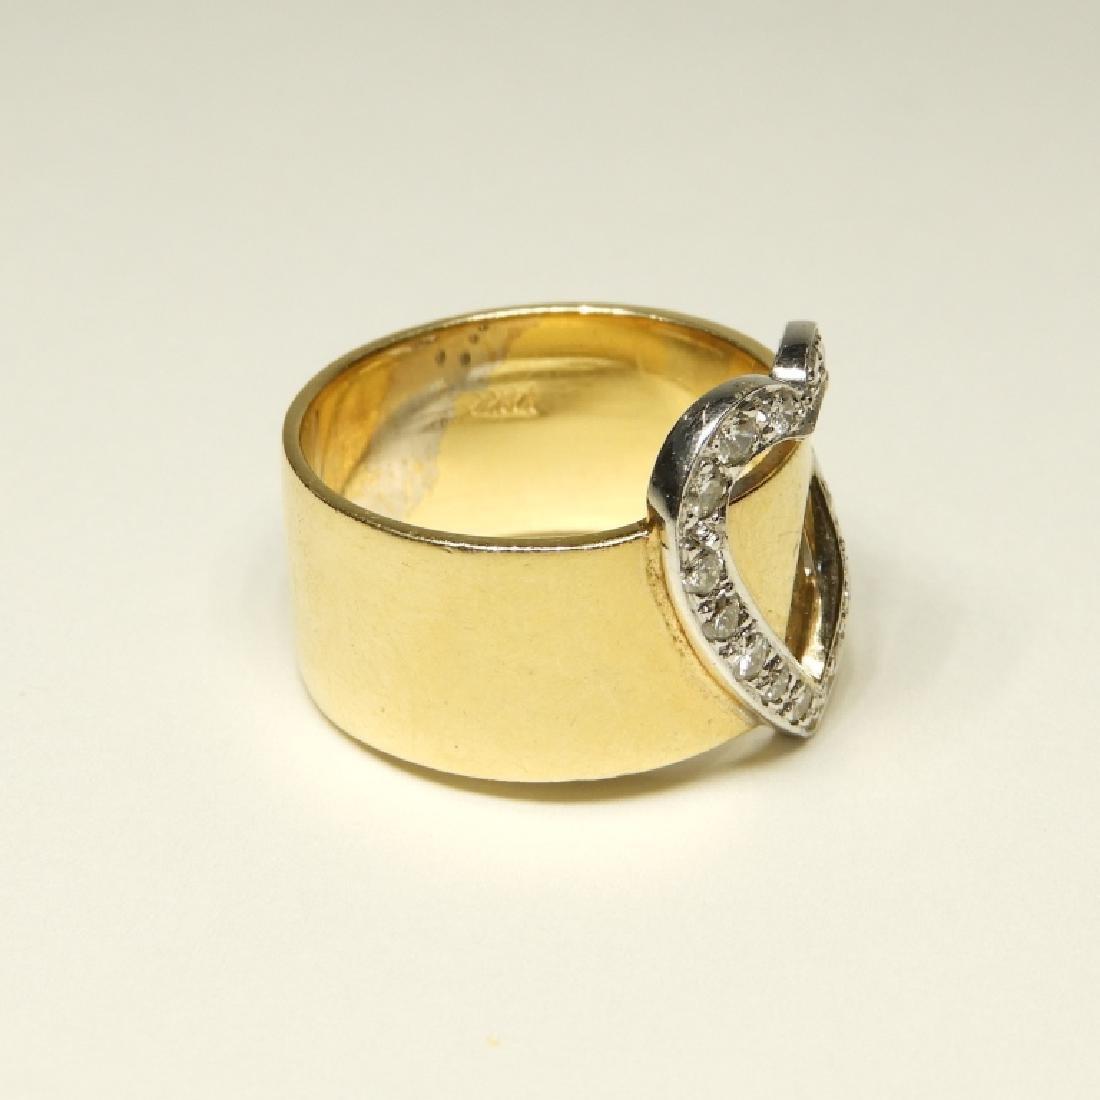 14K Gold Diamond Heart Belt Form Lady's Ring - 3